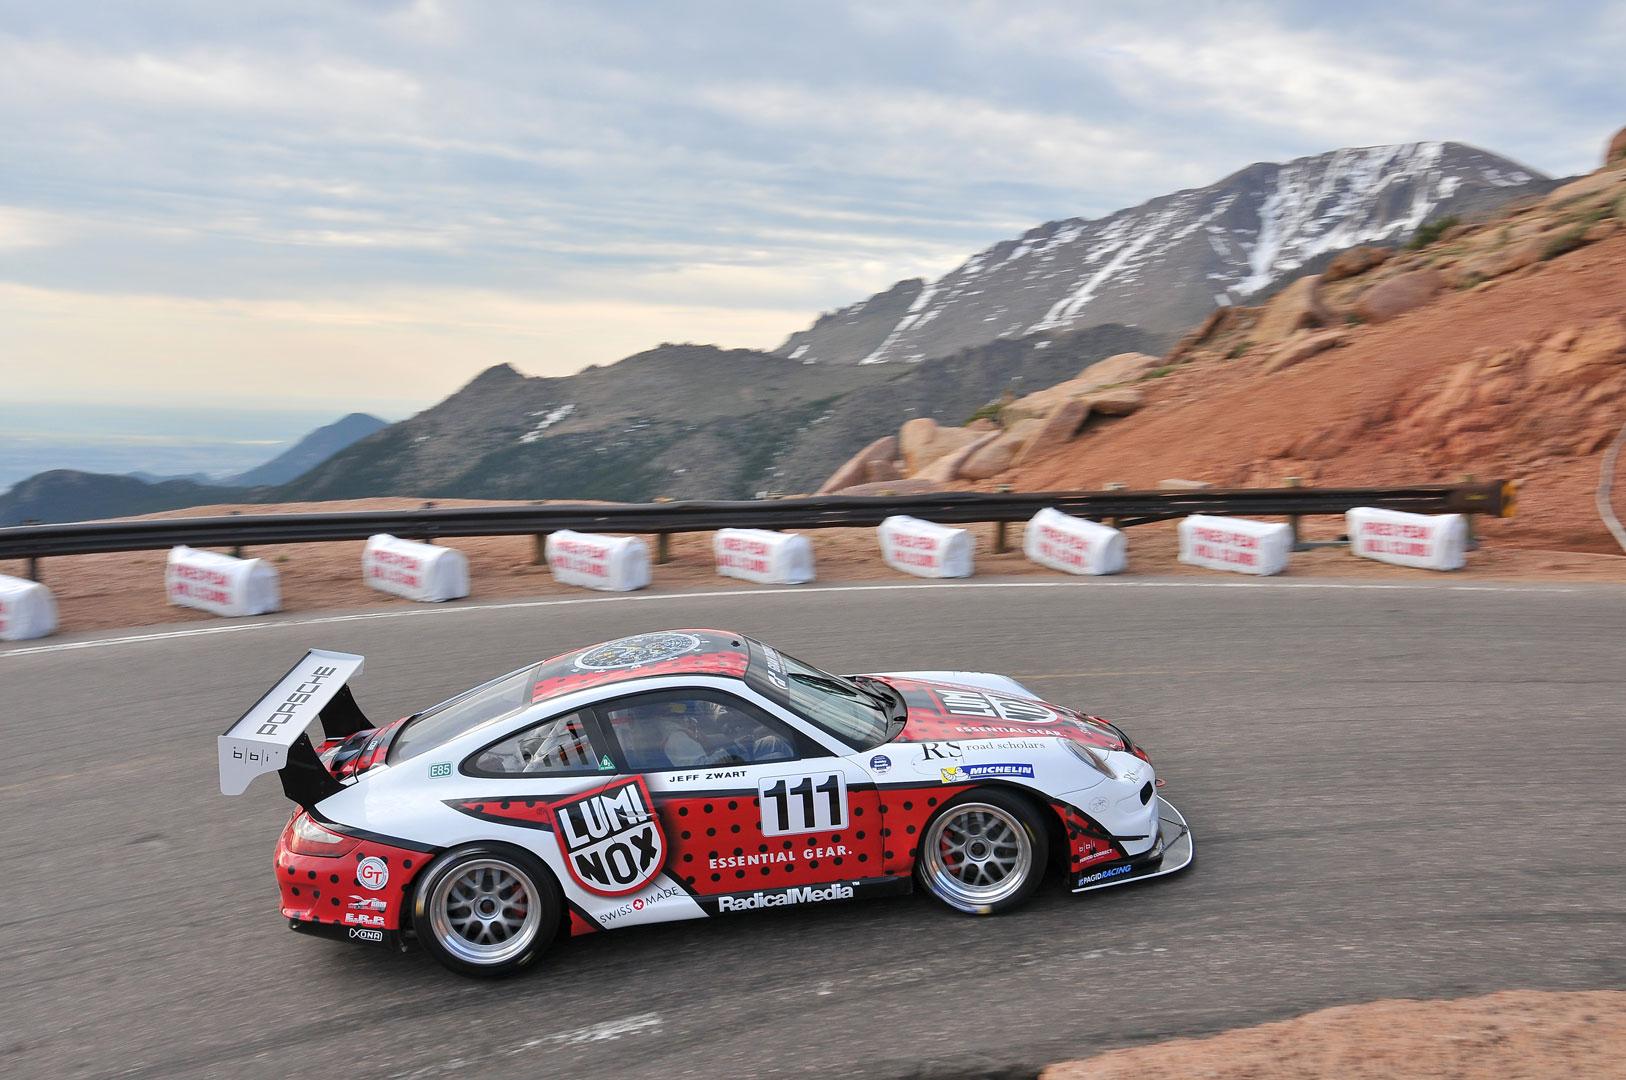 Jeff Zwart Porsche climbing Pikes Peak